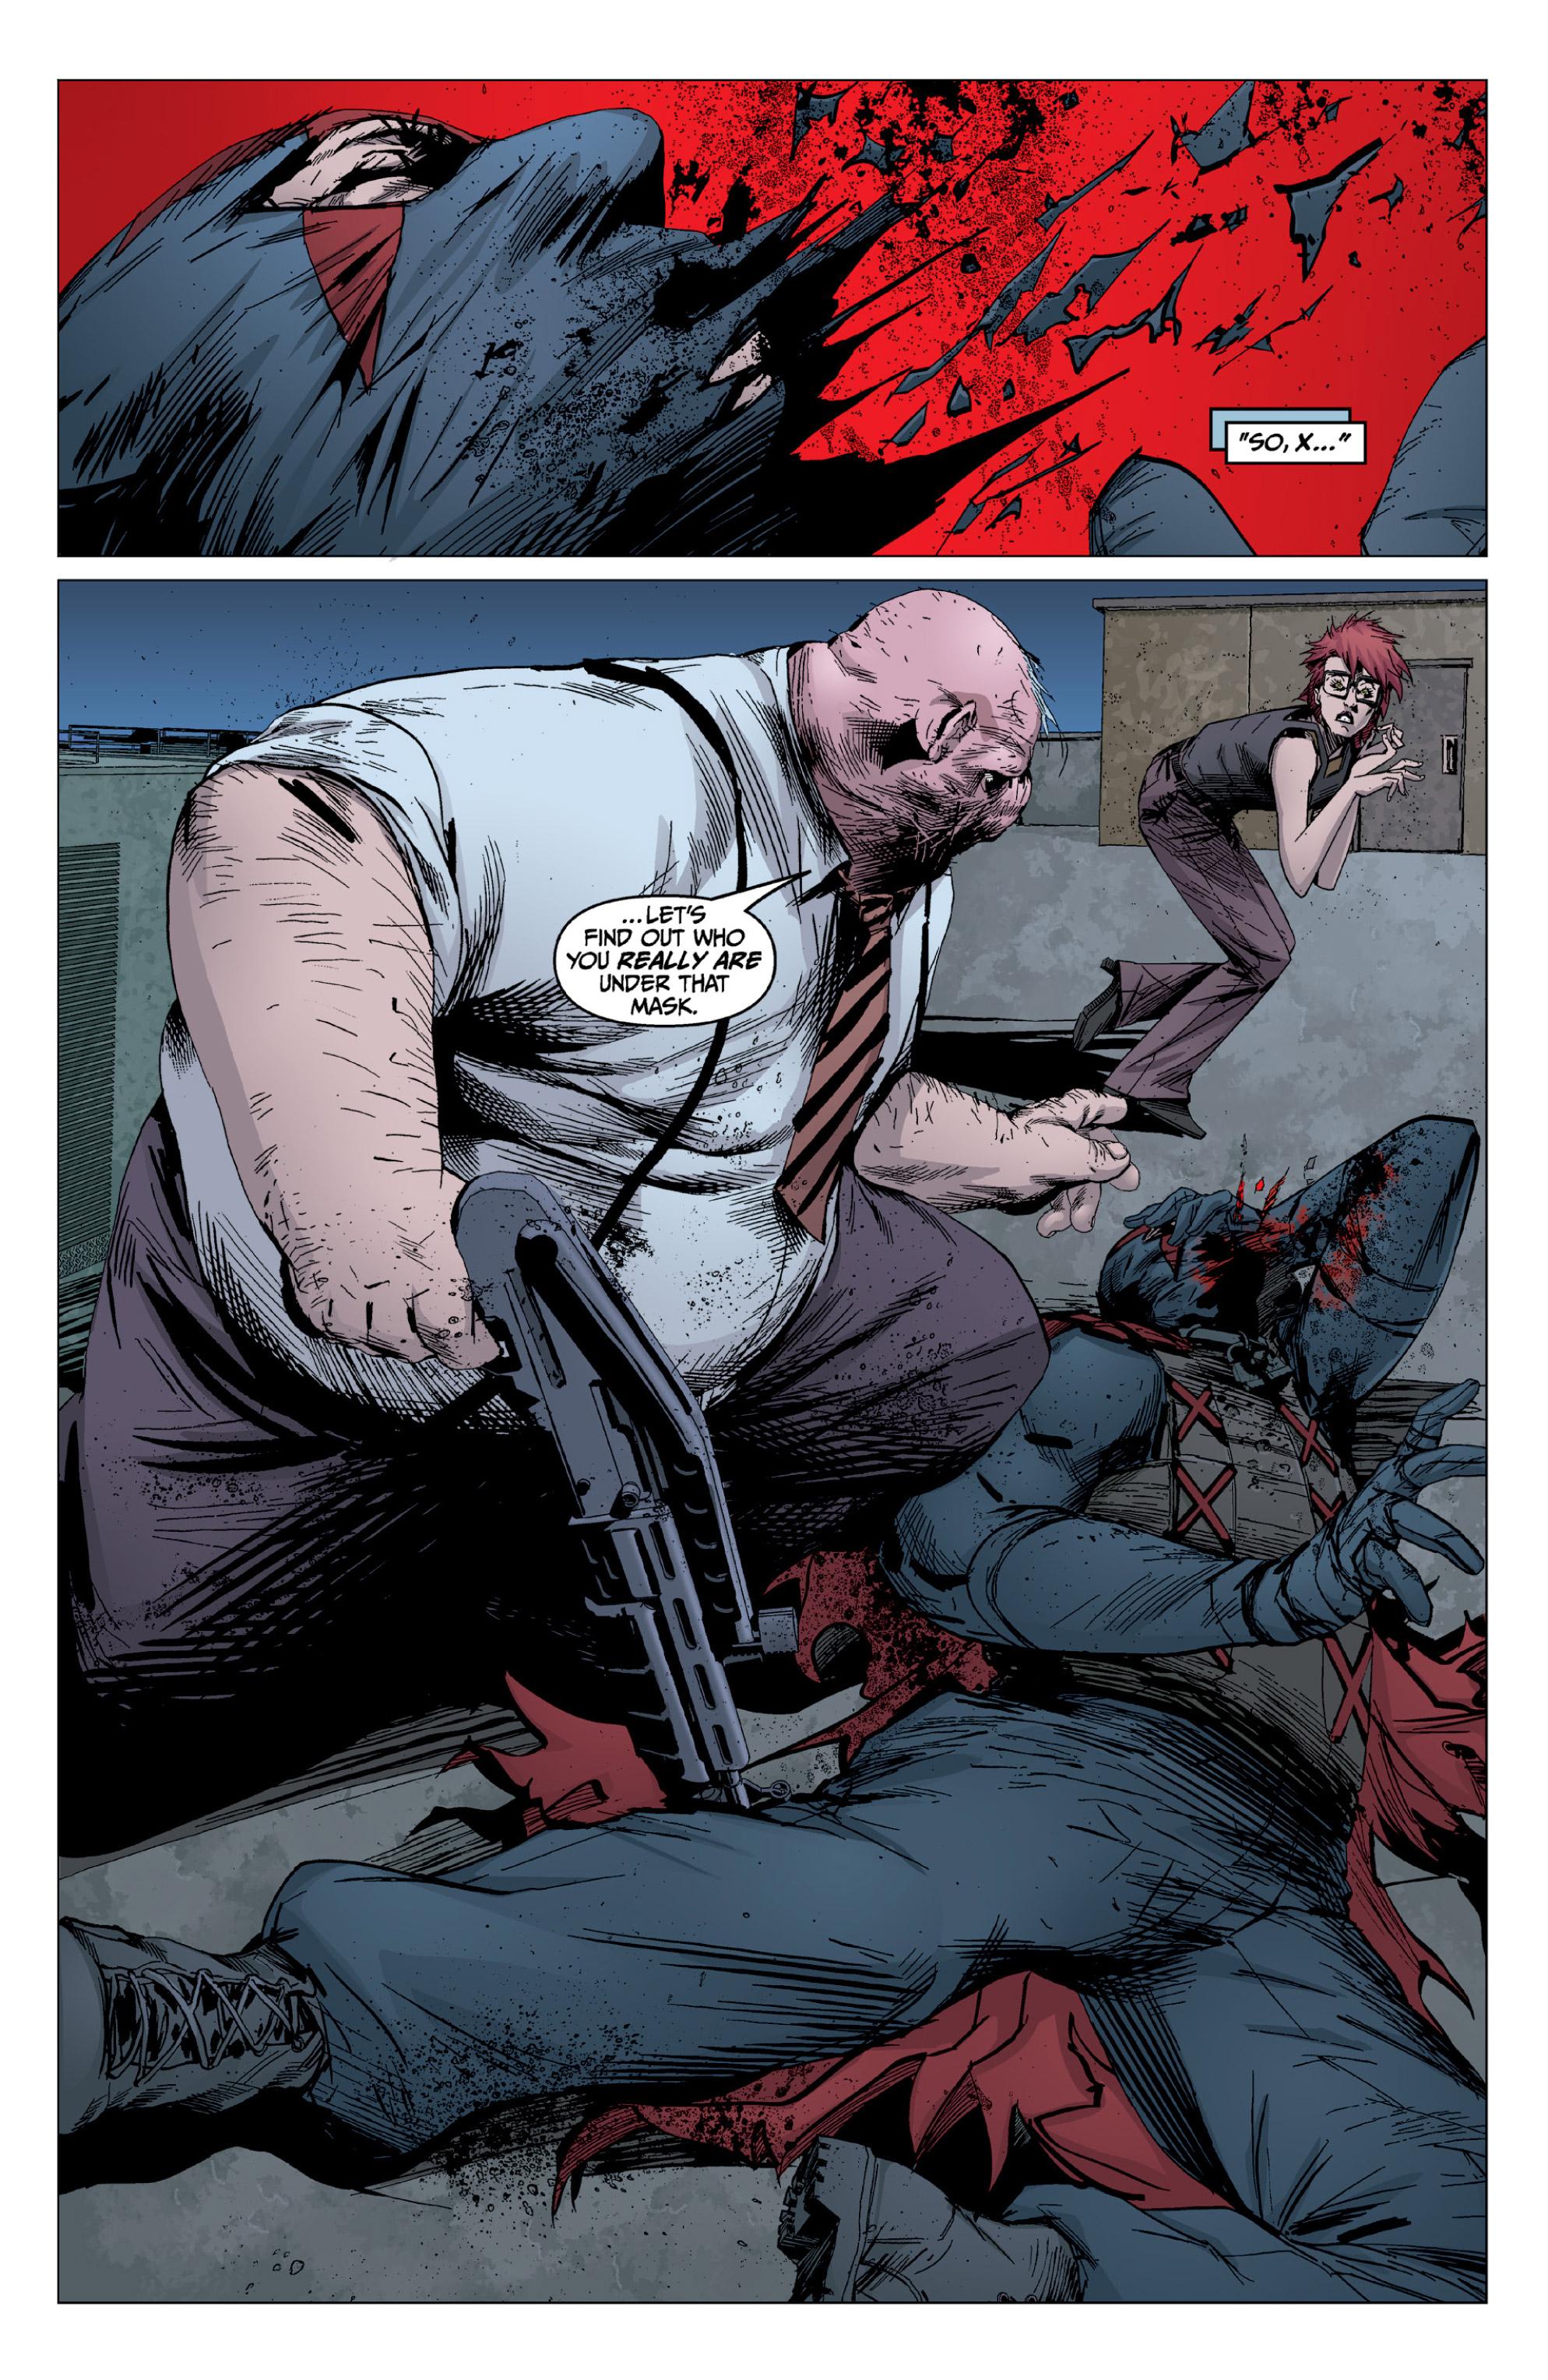 Read online X: Big Bad comic -  Issue # Full - 105